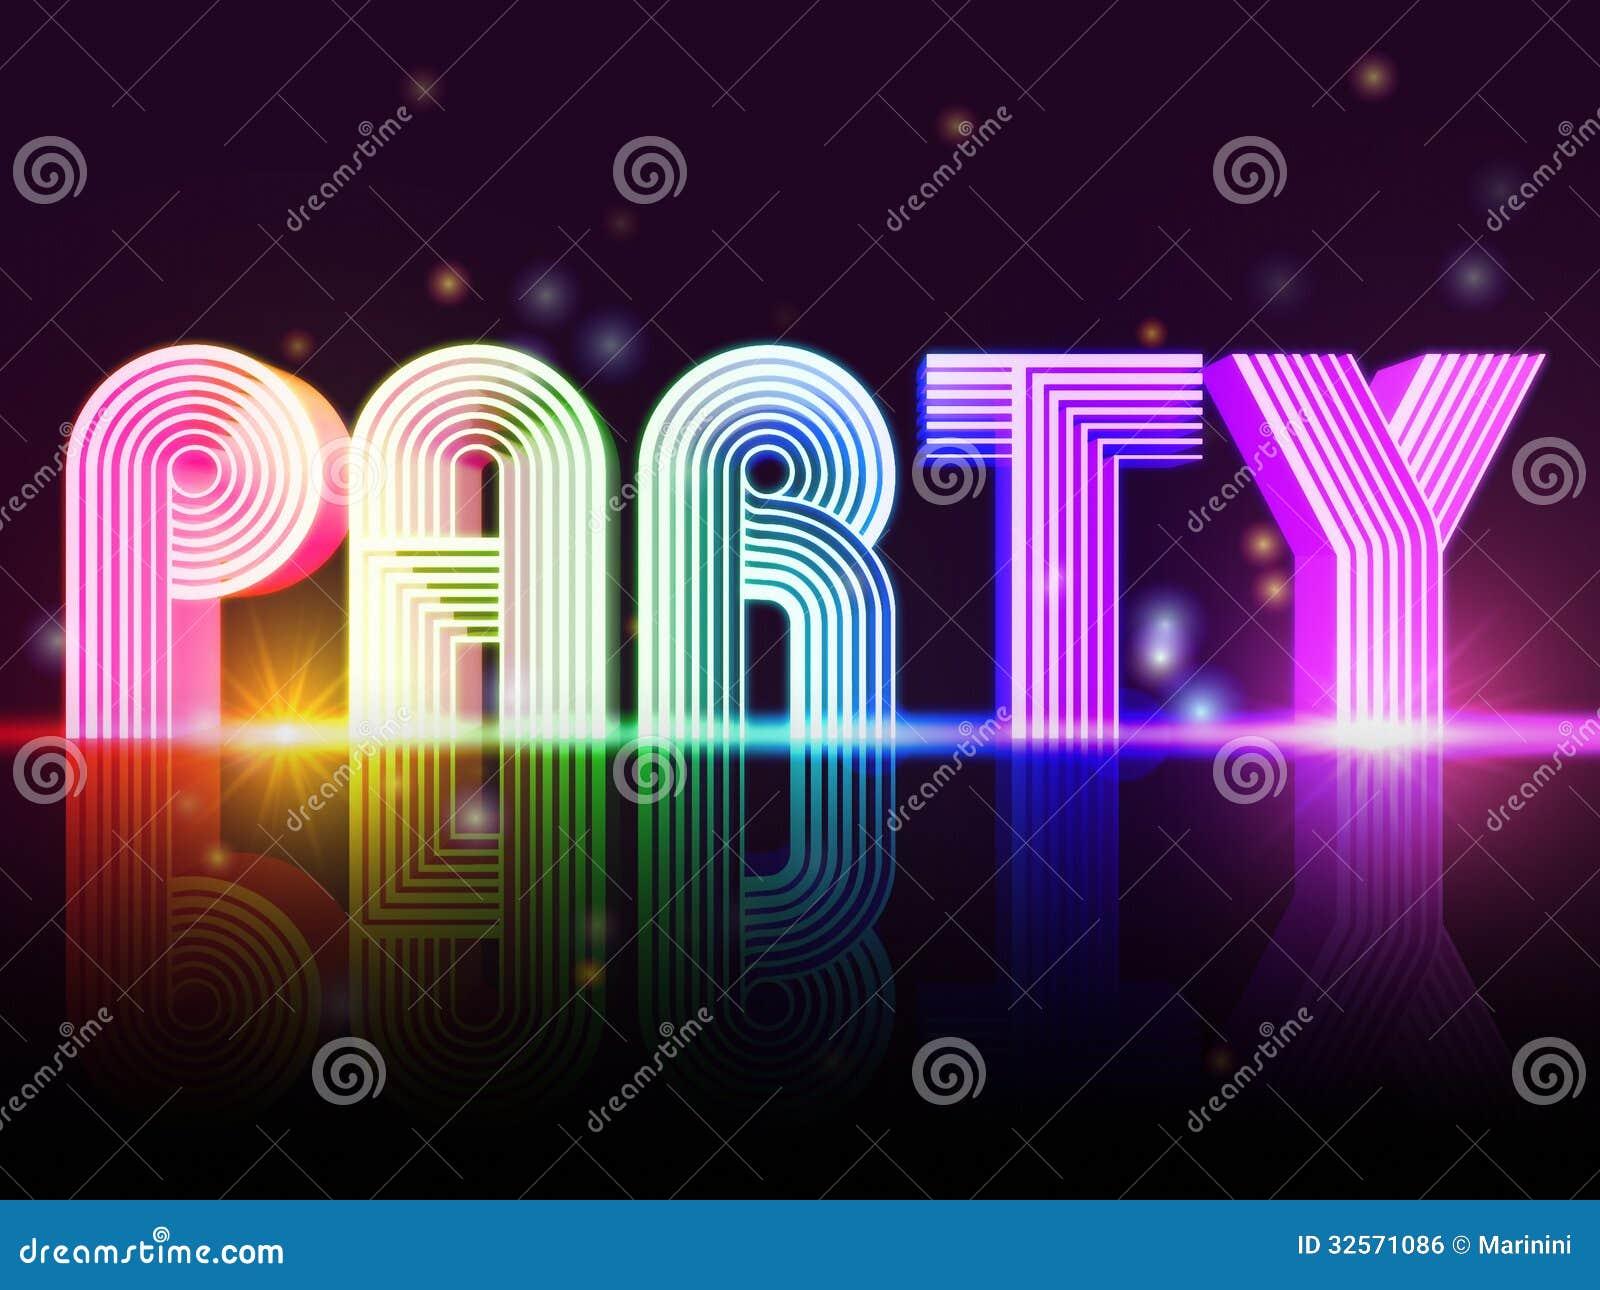 Party poster stock illustration. Illustration of rainbow ...